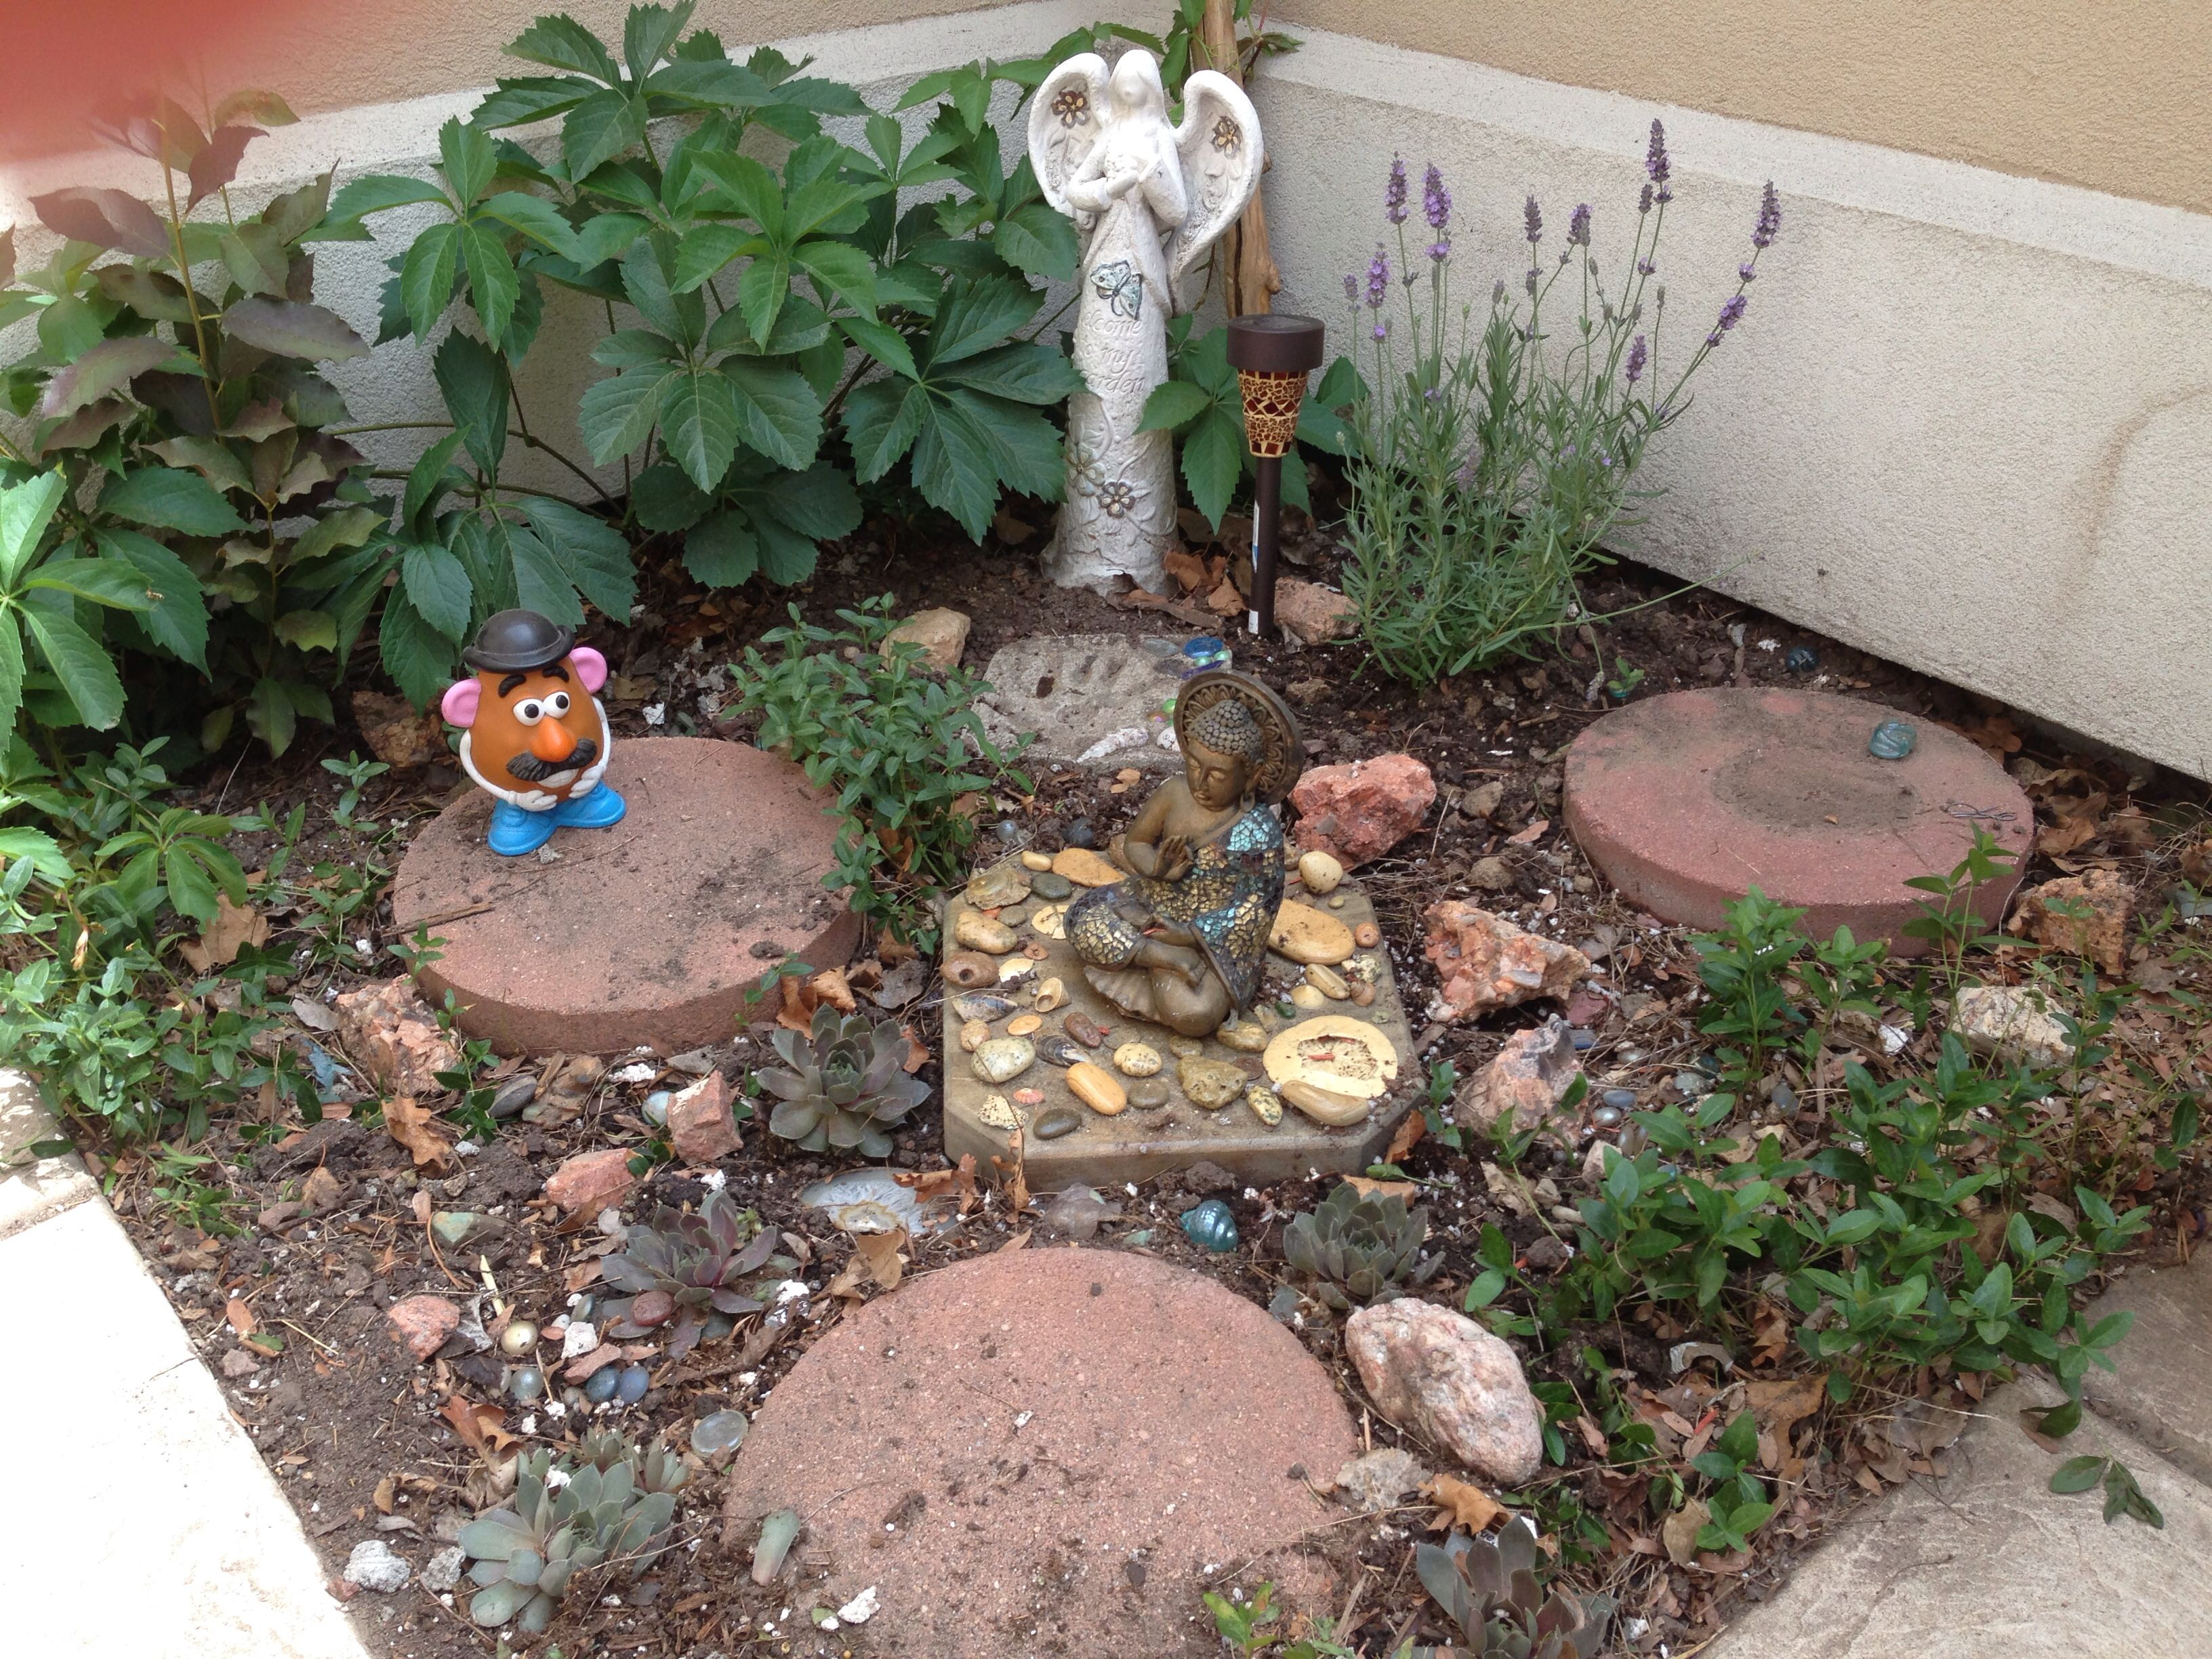 Meditation garden garden ideas pinterest - Meditation garden design ideas ...